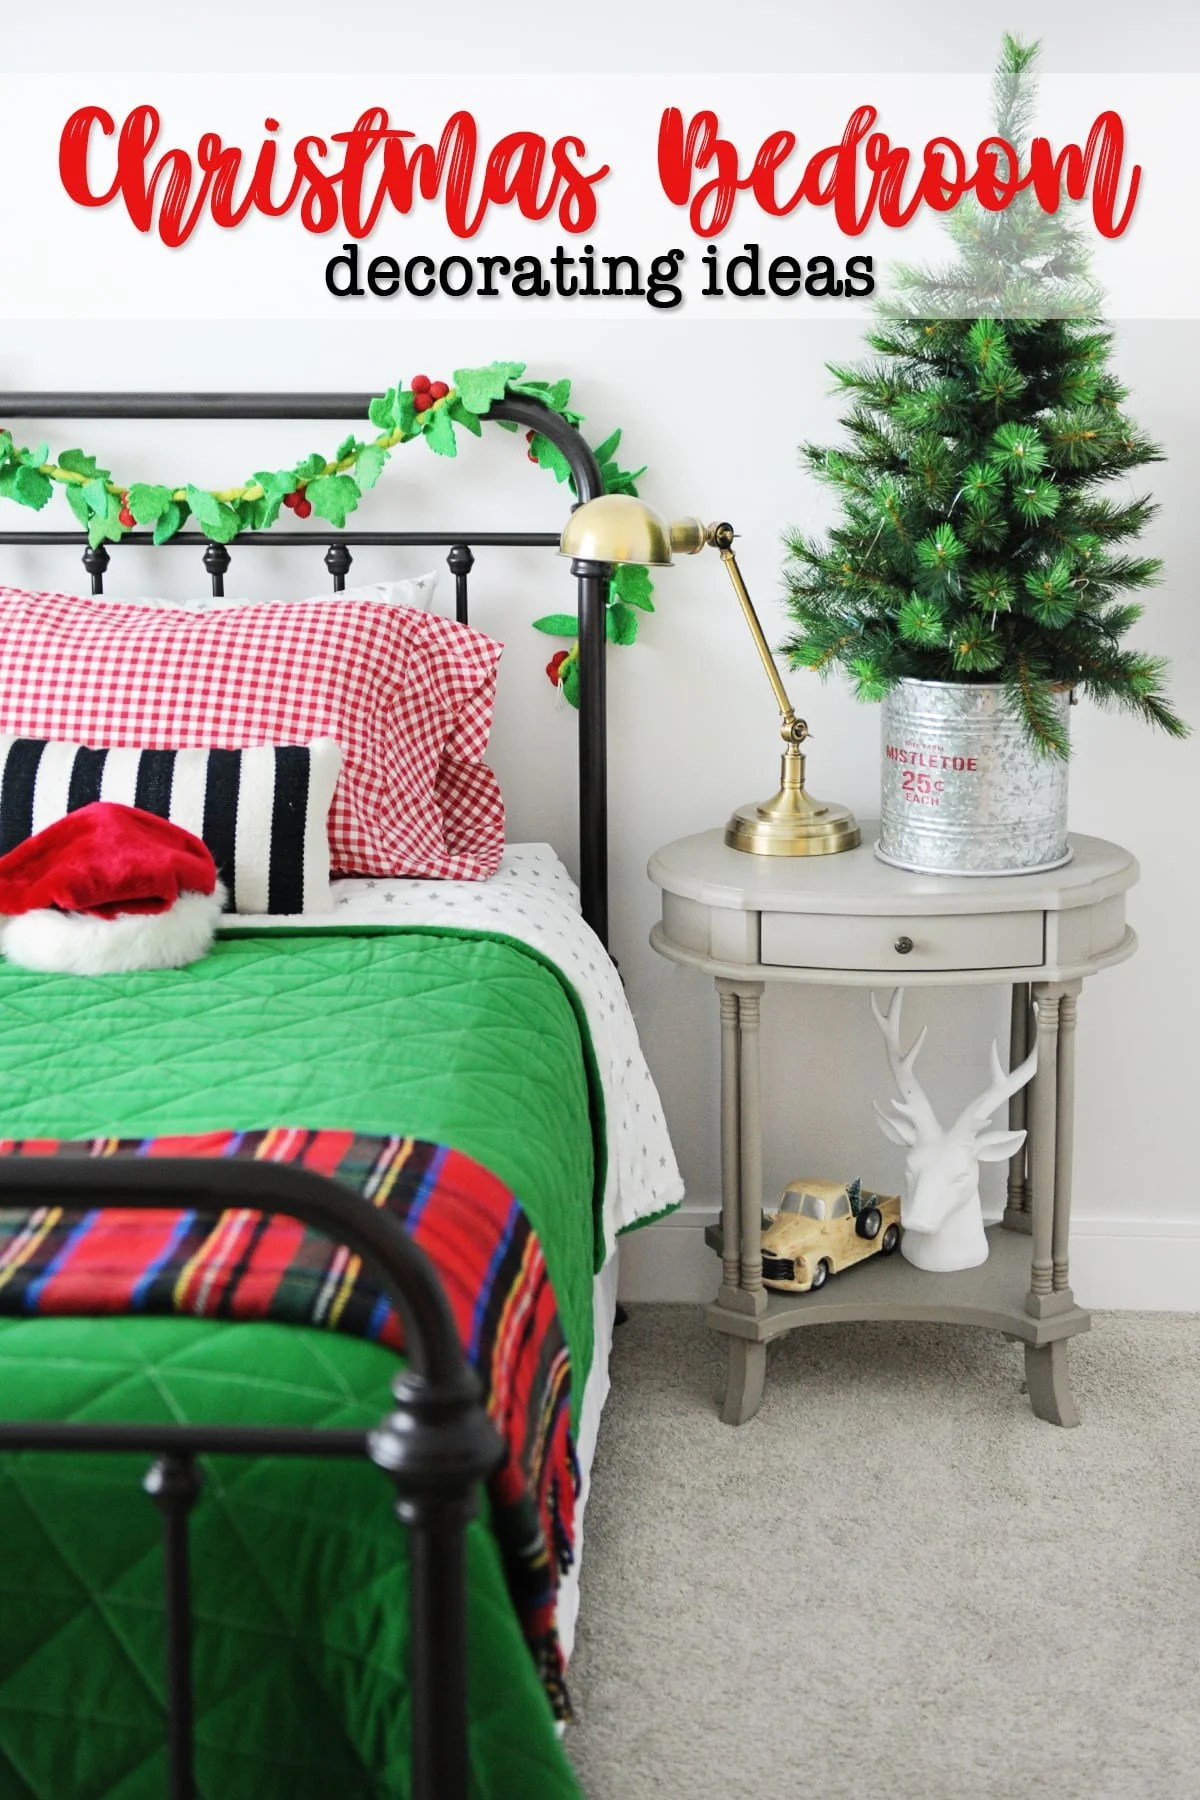 Cute christmas bedroom decorating ideas